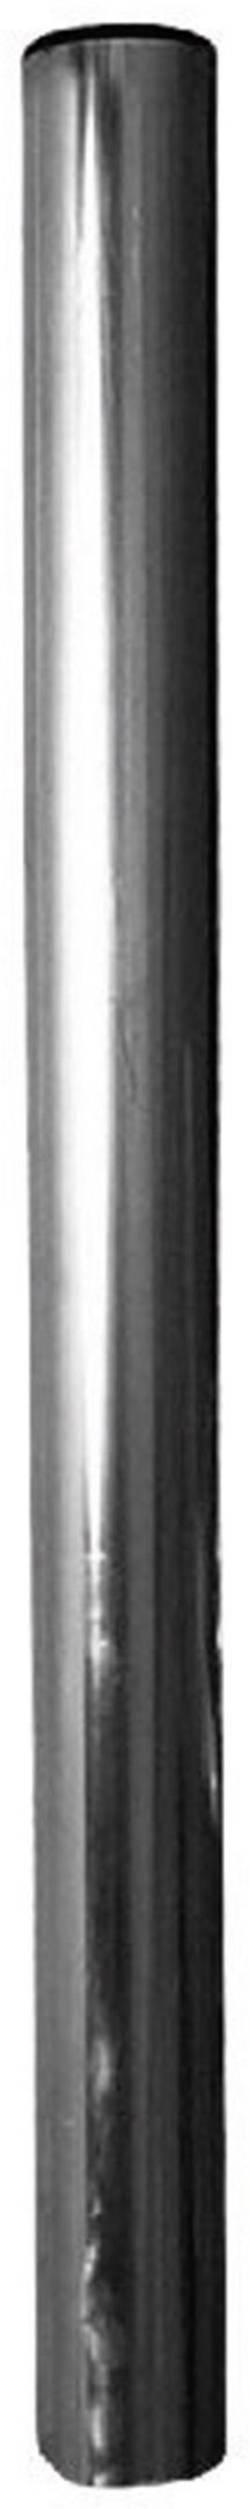 Image of Antennenmast Aluminium A.S. SAT 35100 Durchmesser: 50 mm Länge: 1 m